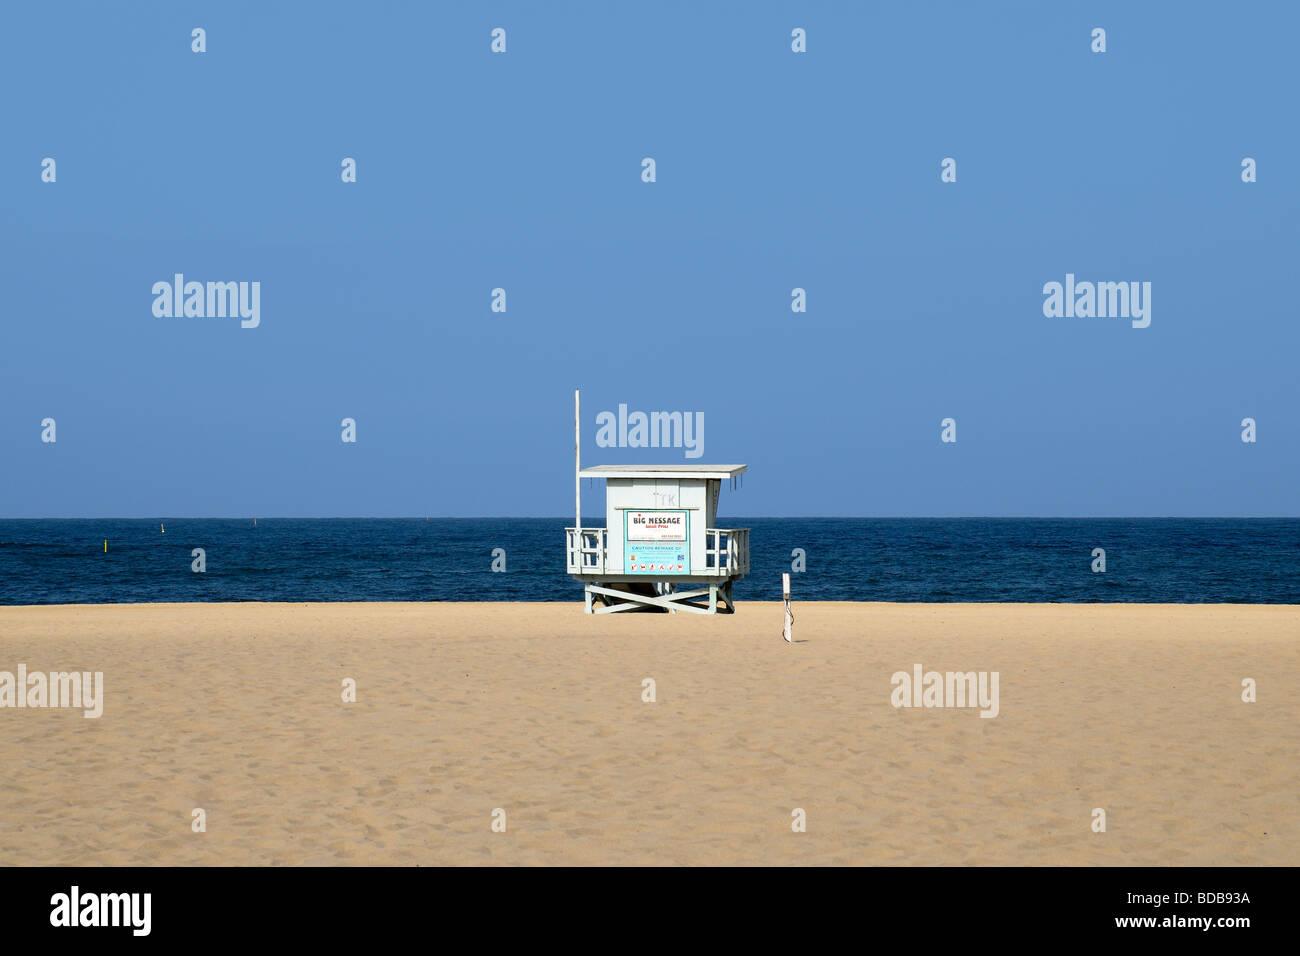 Lifeguard tower on deserted beach, Hermosa Beach, California, USA - Stock Image